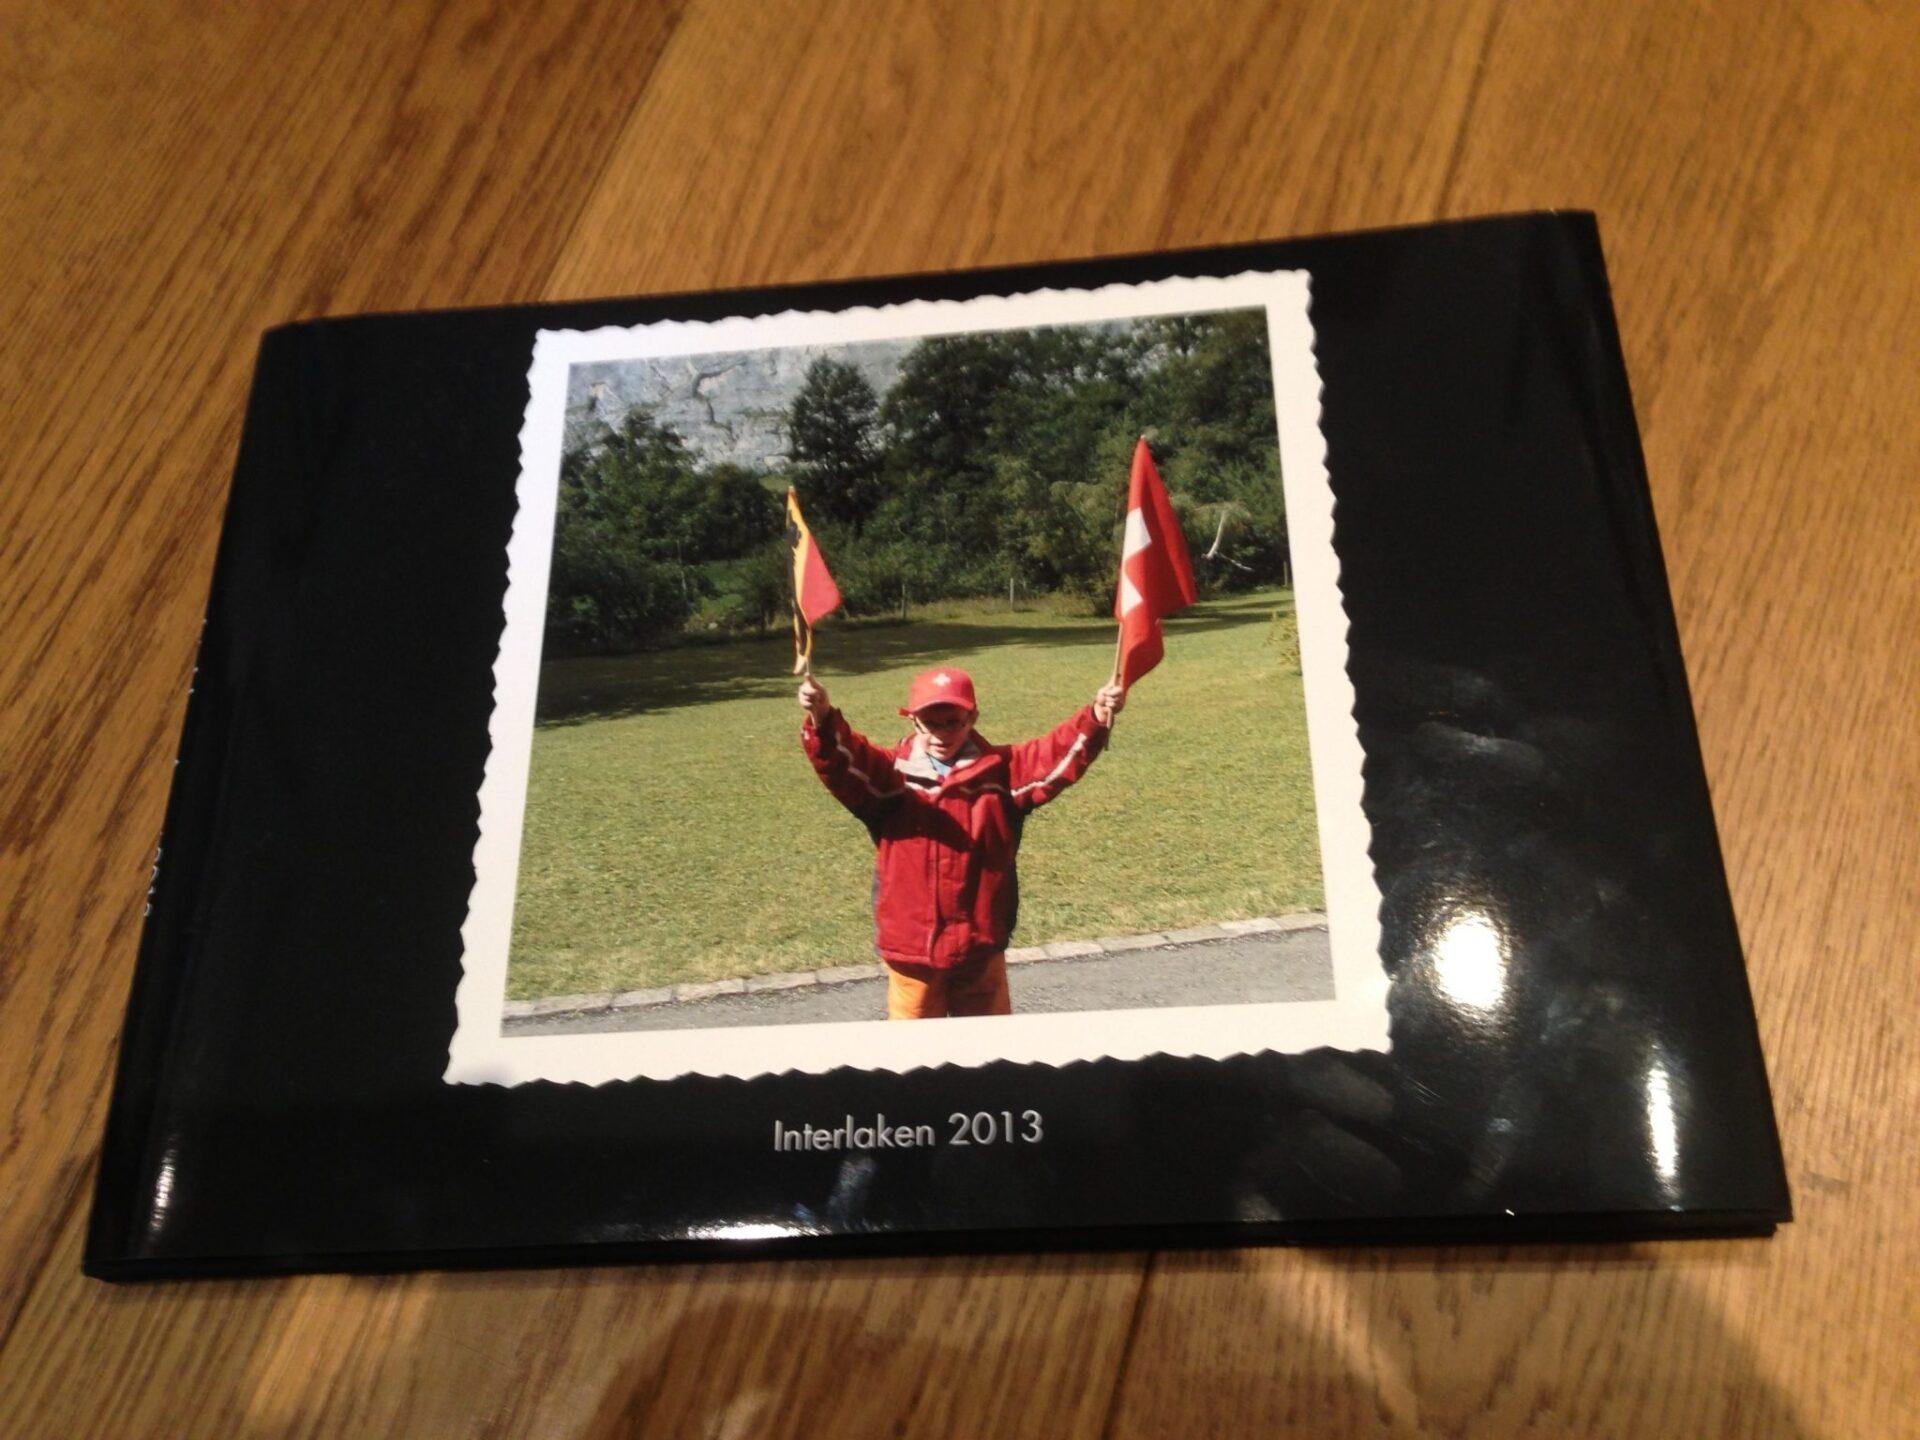 Truprint Photo Gifts: Photobooks